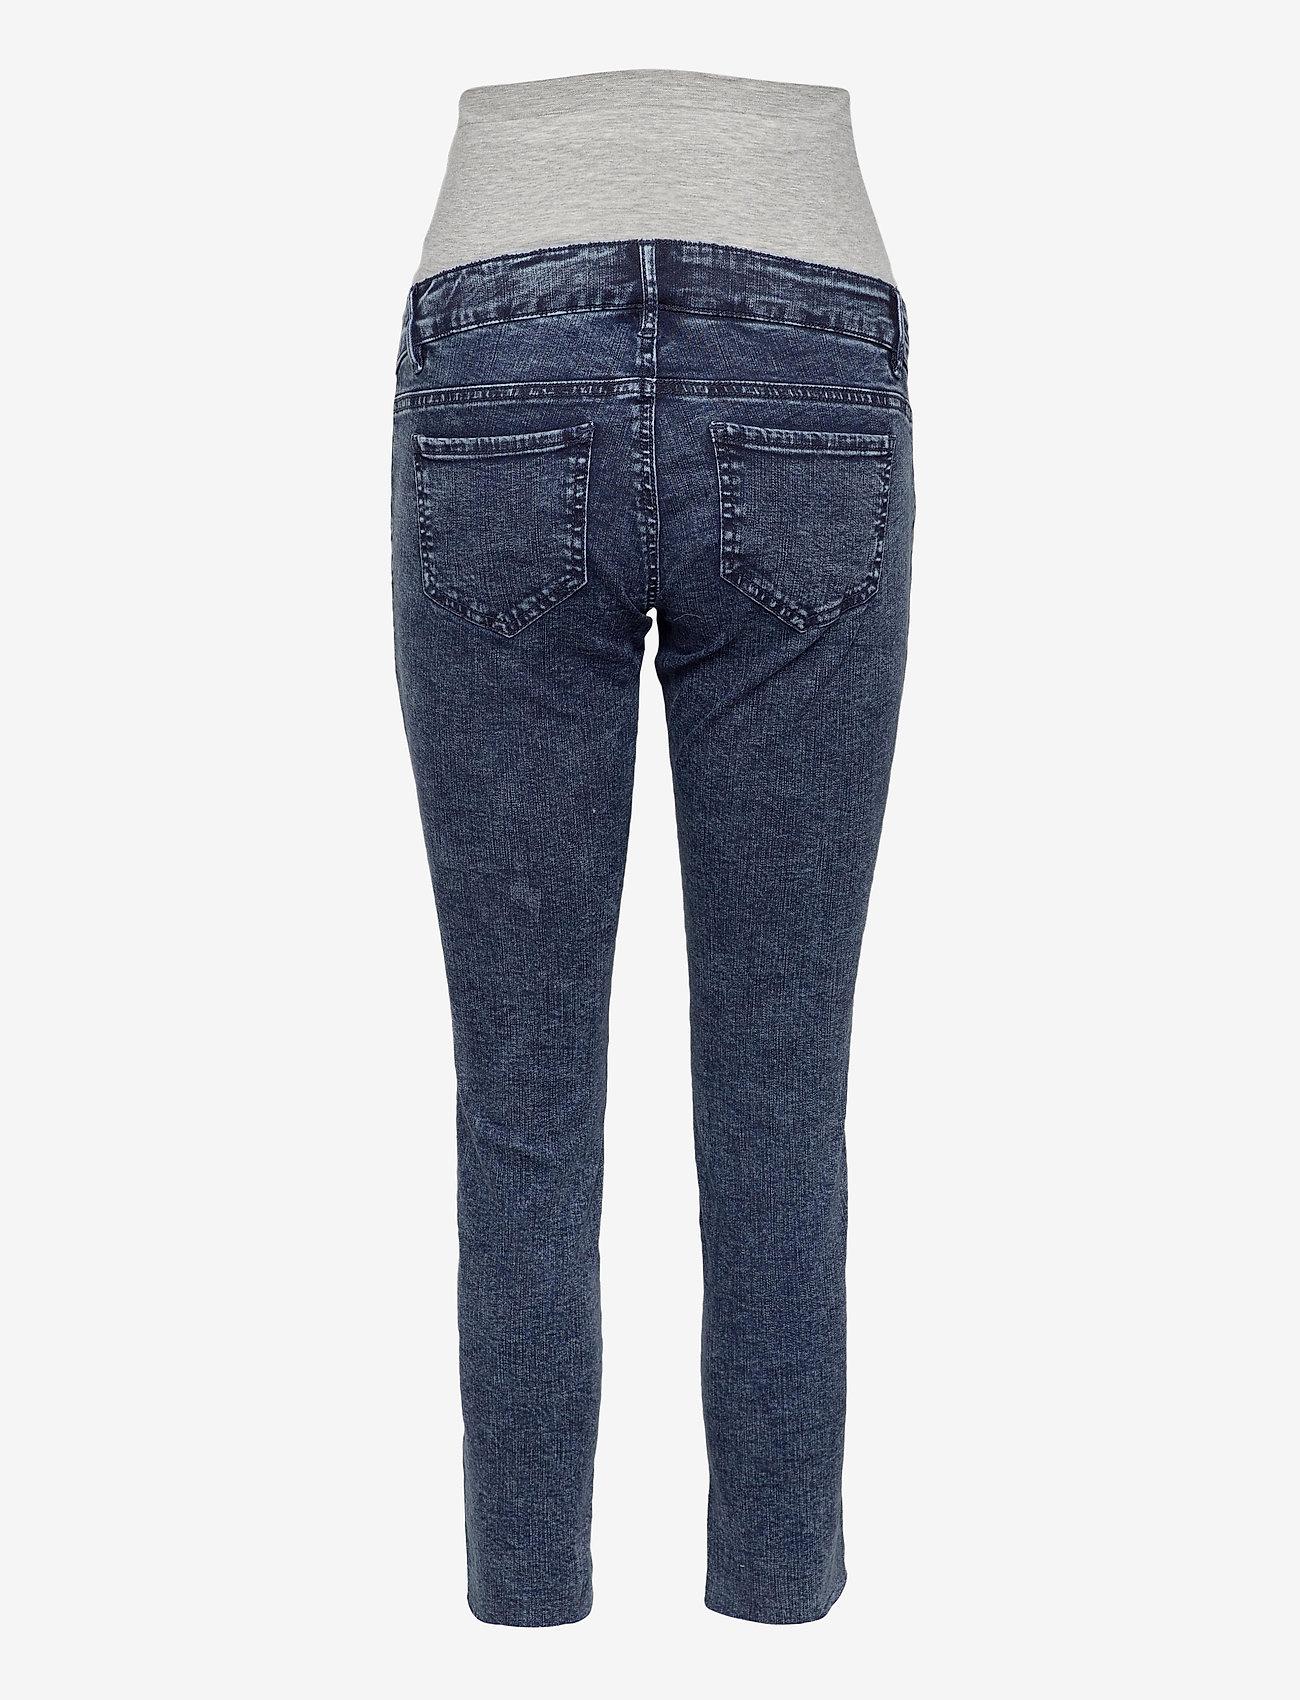 Mamalicious - MLVENTURA CROPPED SLIM JEANS - slim jeans - blue denim - 1